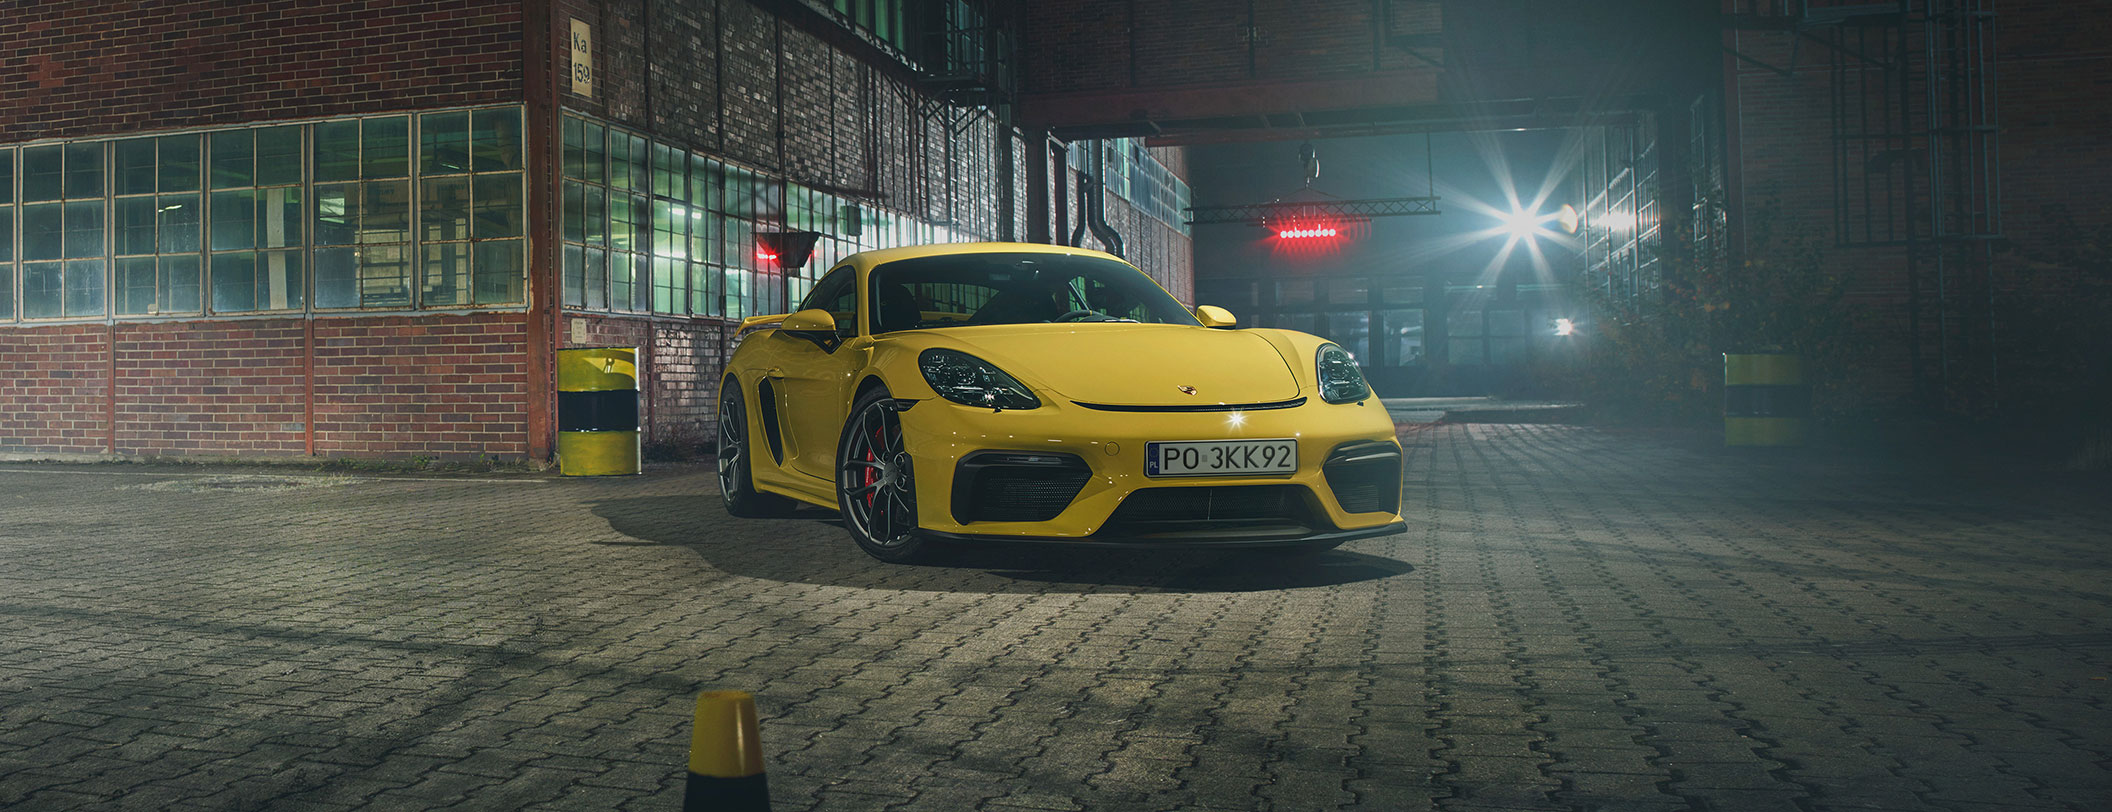 Bądź eko z Porsche 6